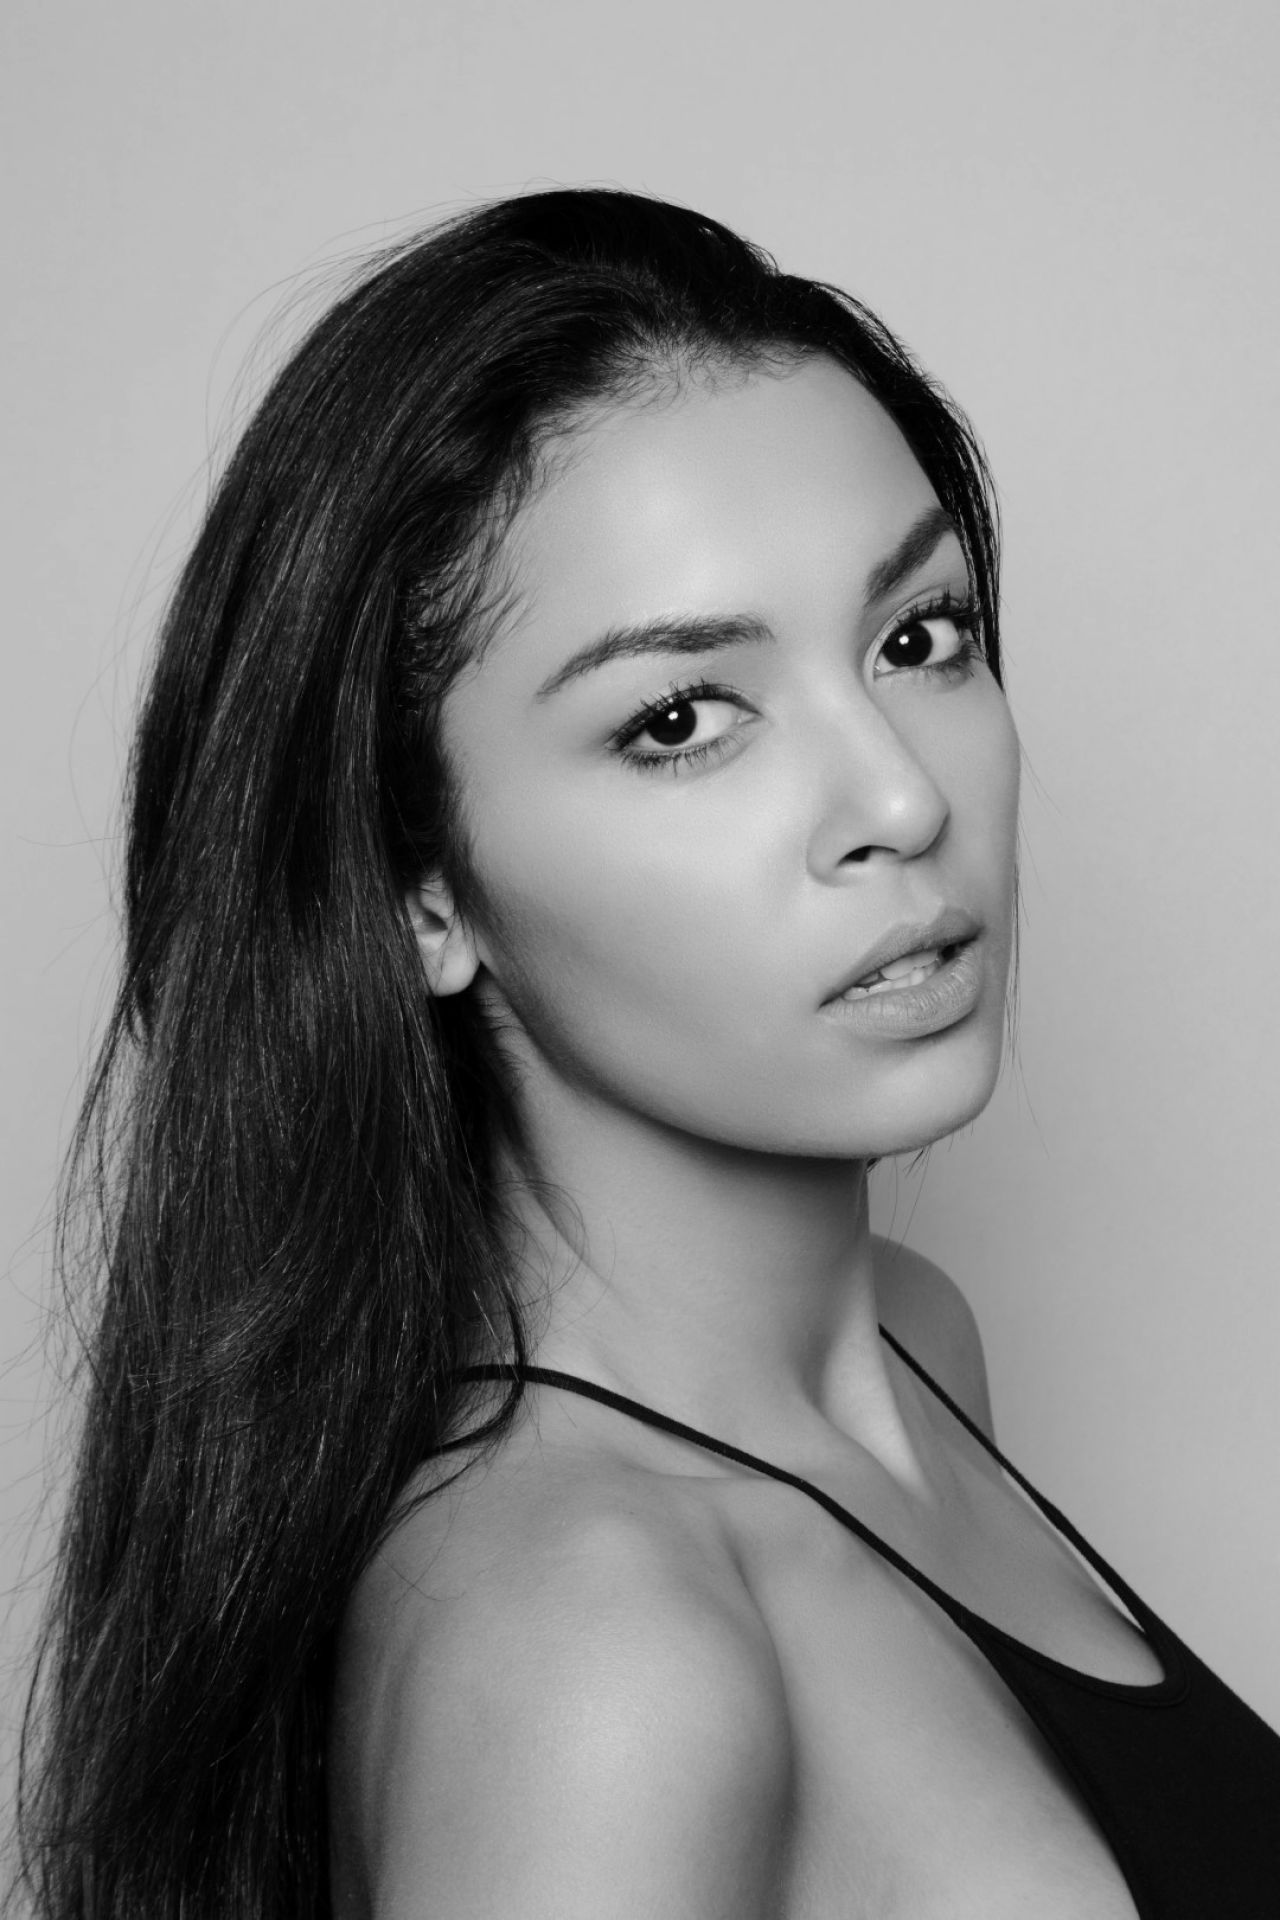 julianne-britton-physical-modelos-photoshoot-2017-3.jpg (1280×1920)